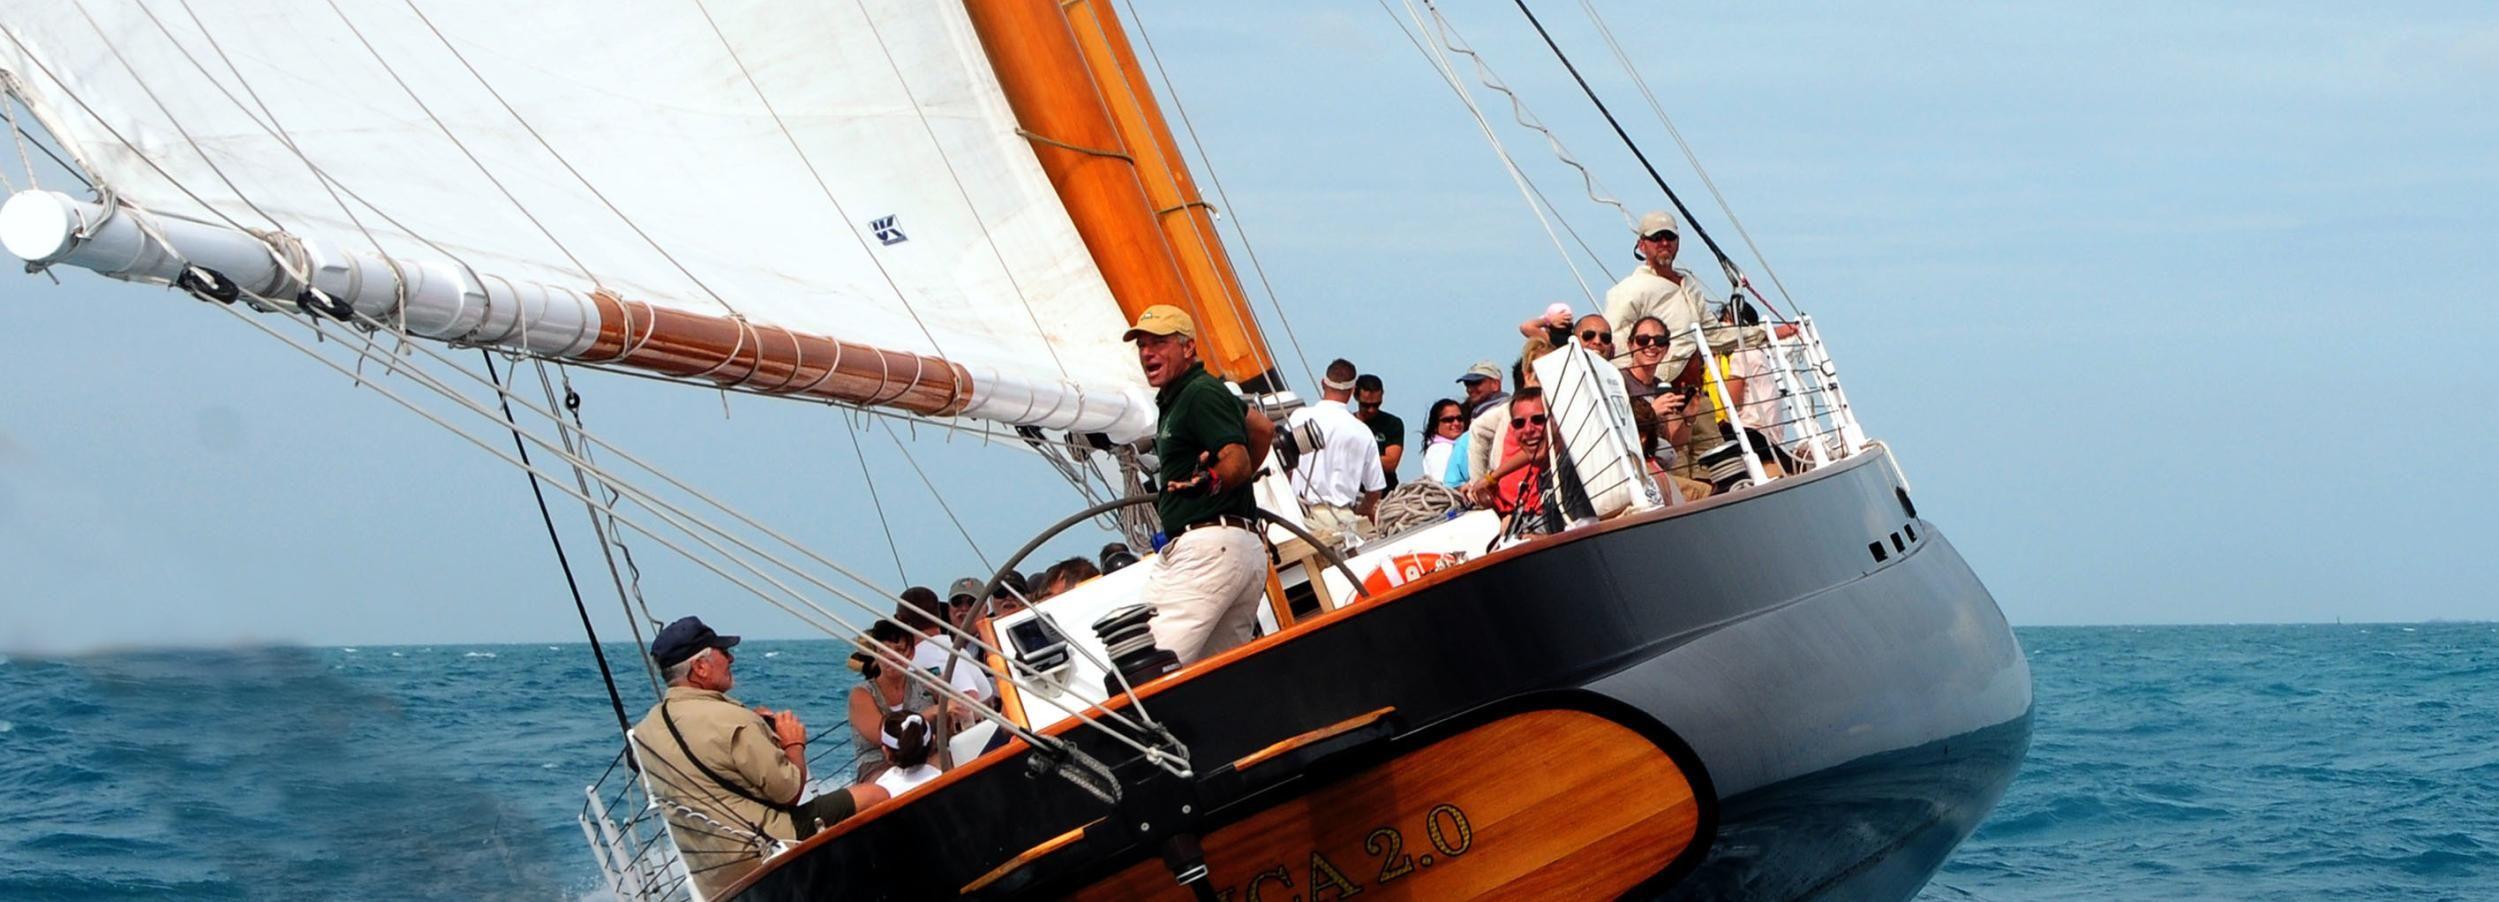 Key West: 1.5-Hour Sail on the Schooner America 2.0